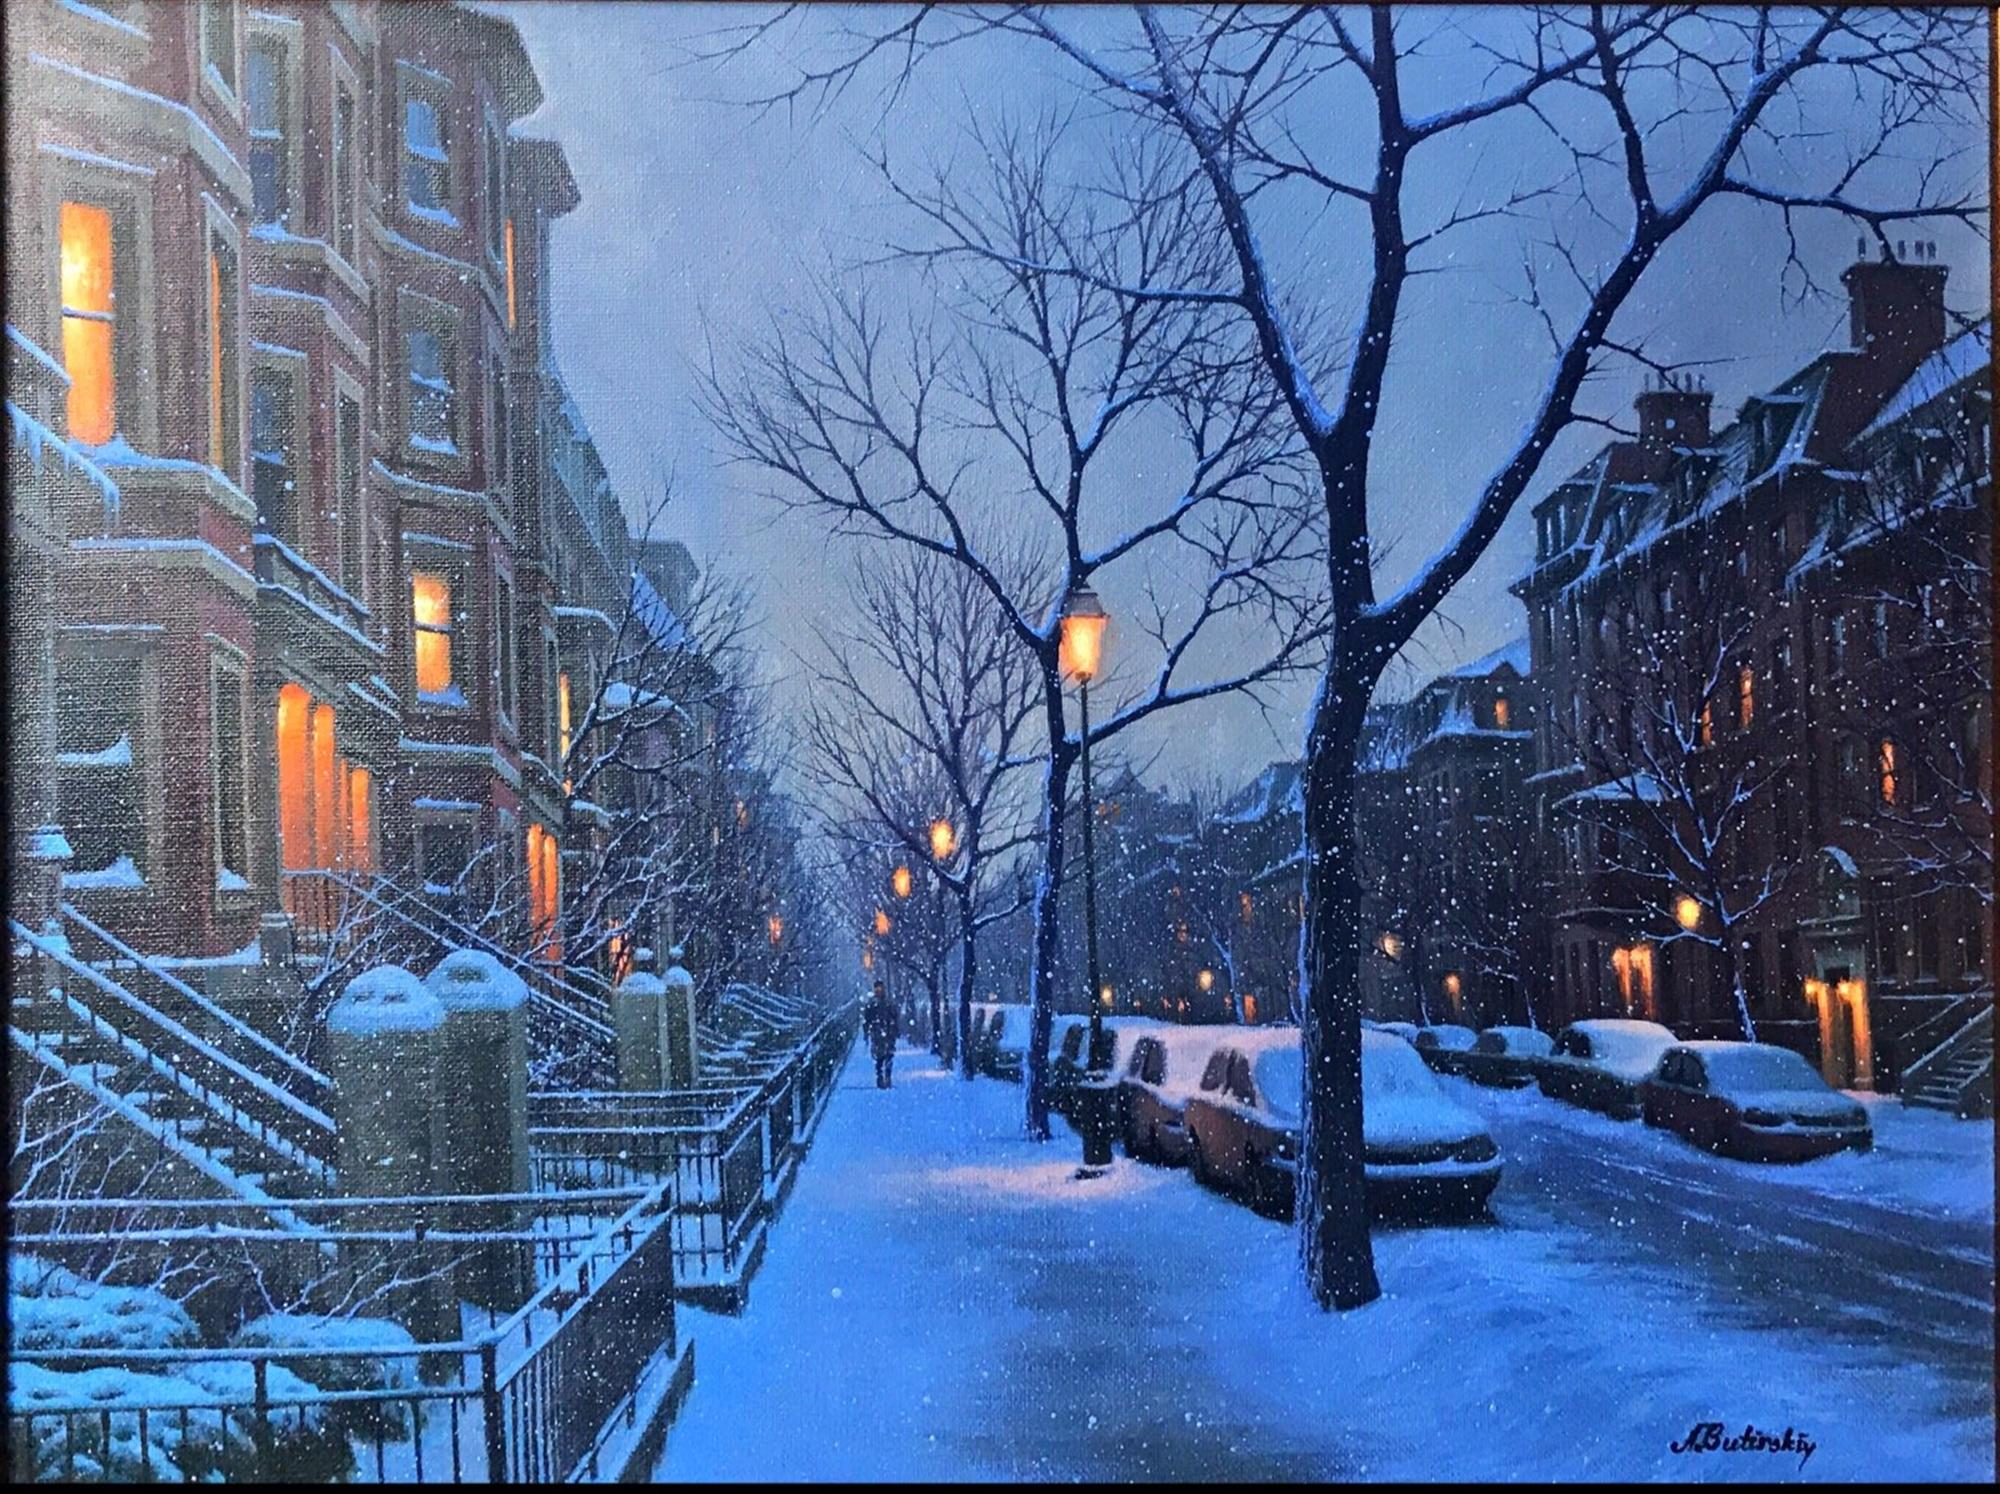 South Boston Flurries by Alexei Butirskiy